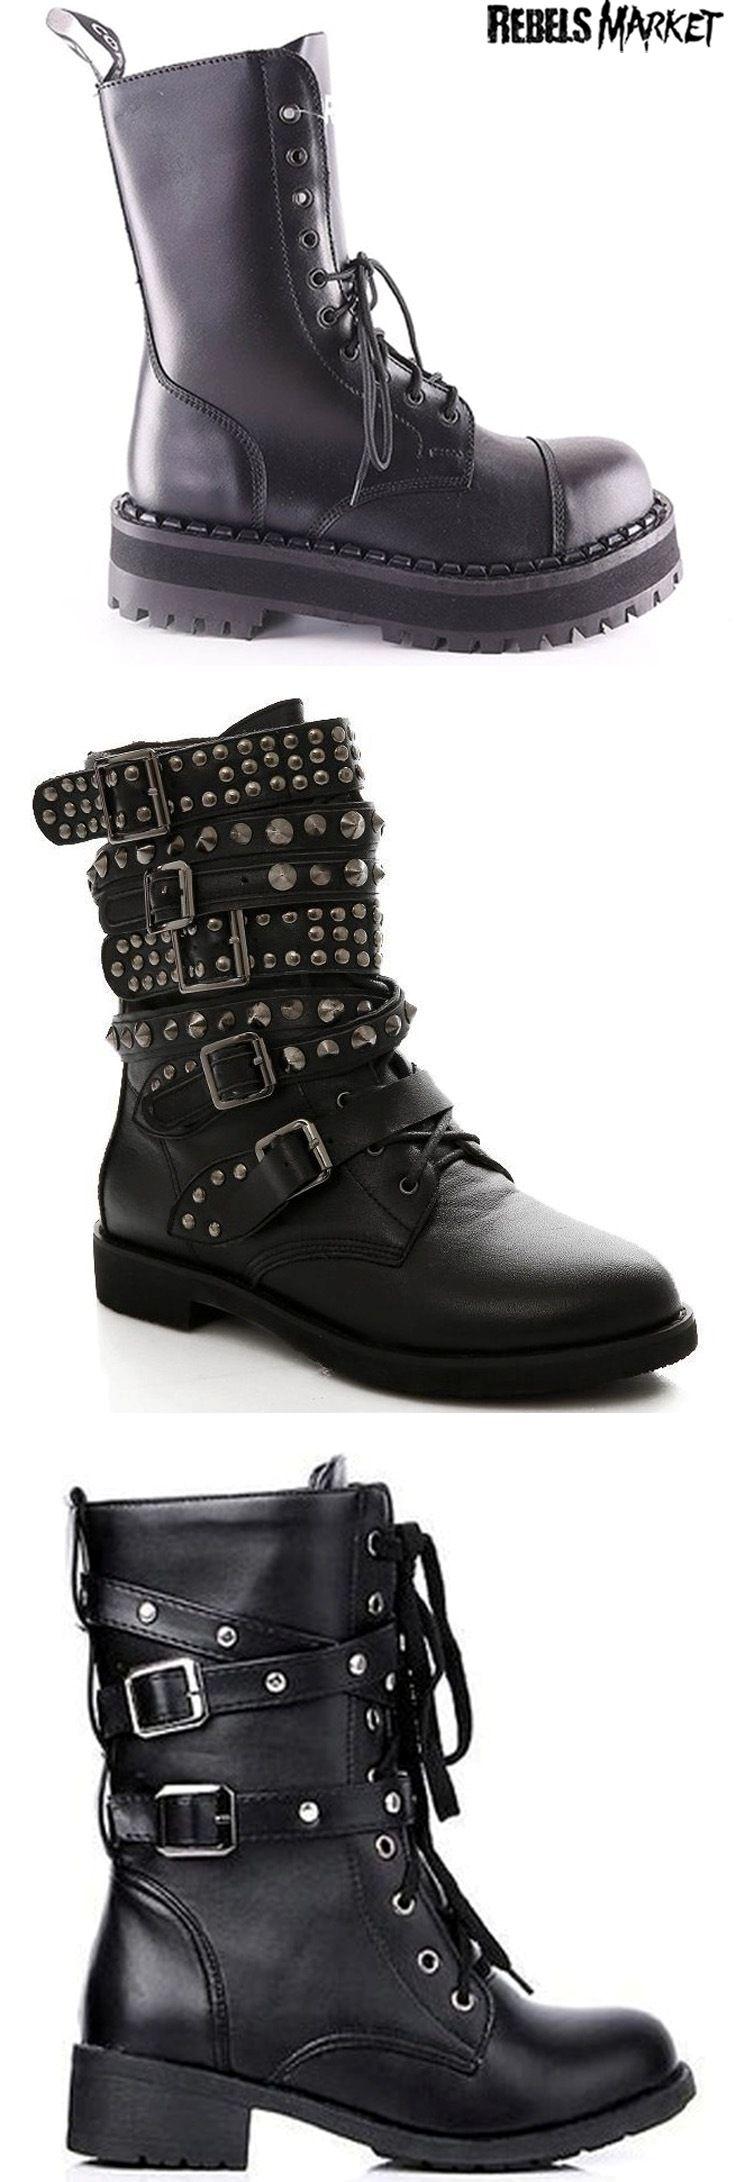 Shop punk boots at RebelsMarket!